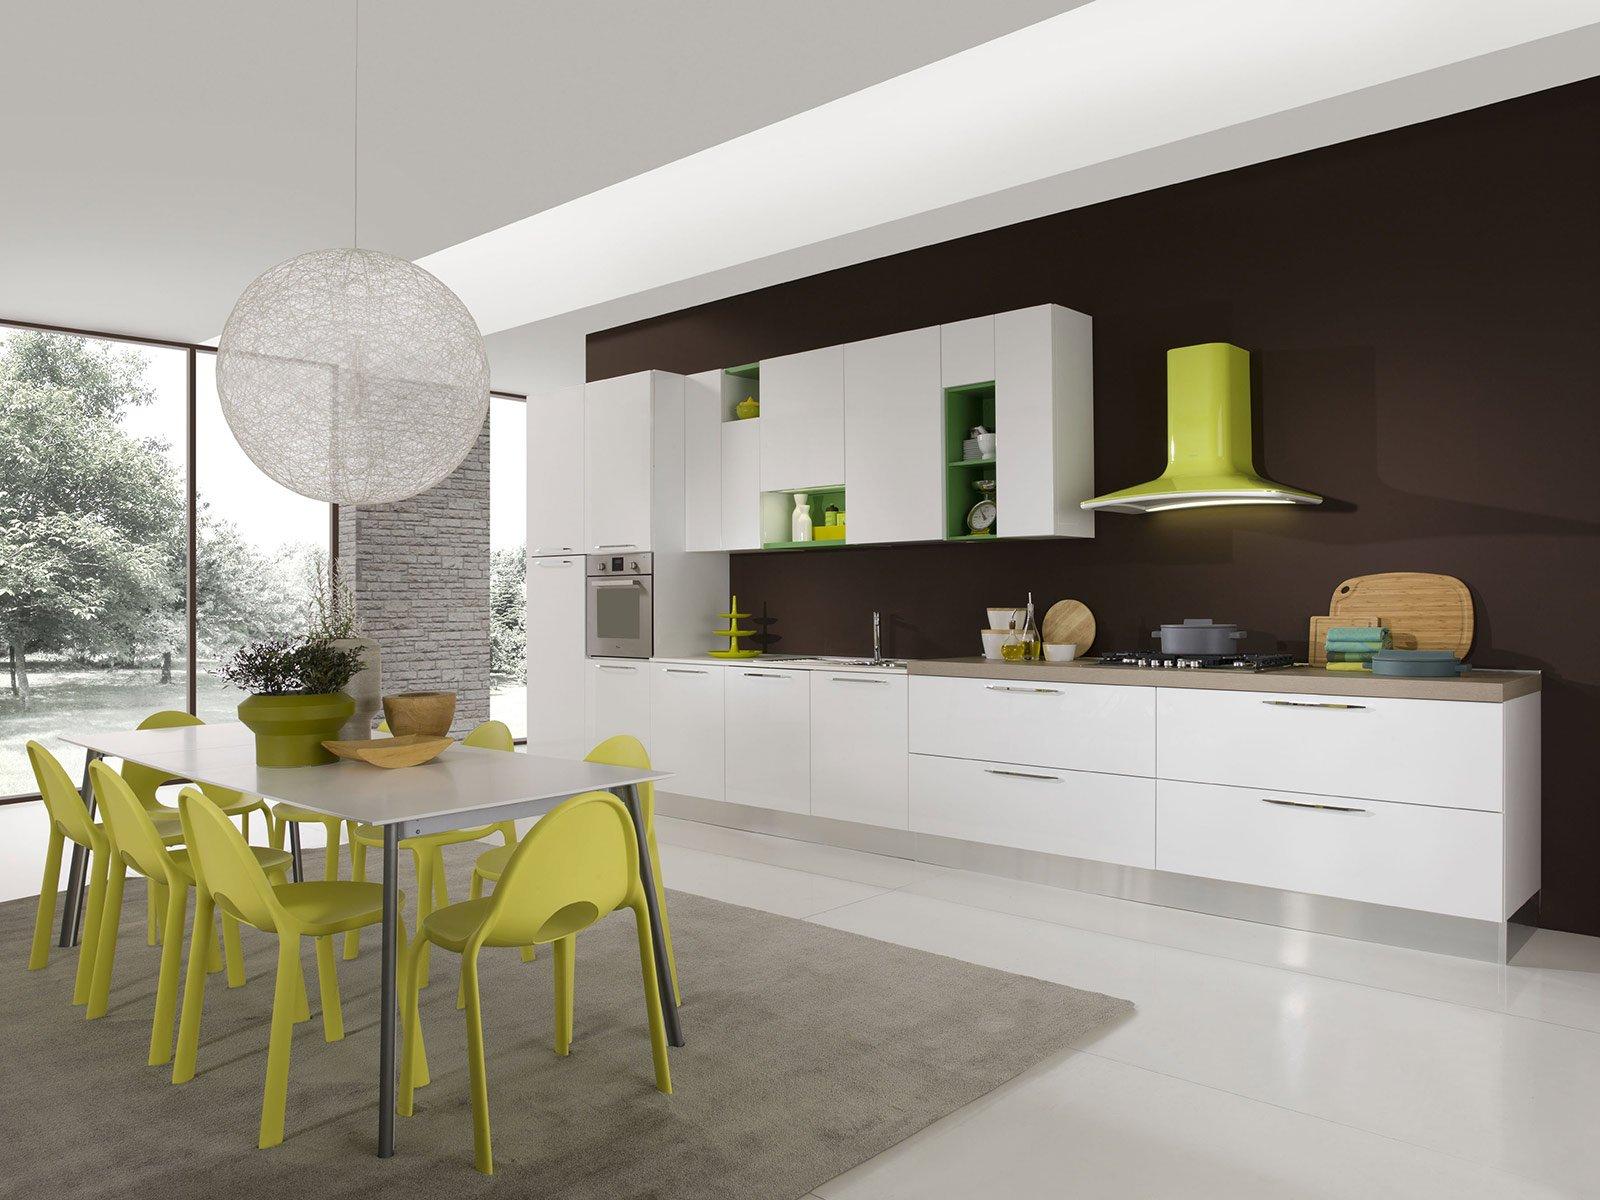 Di Aran Alterna Basi Di Diverse Misure Pensili E Colonne Frigo E #928E39 1600 1200 Immagini Di Cucine Moderne Piccole